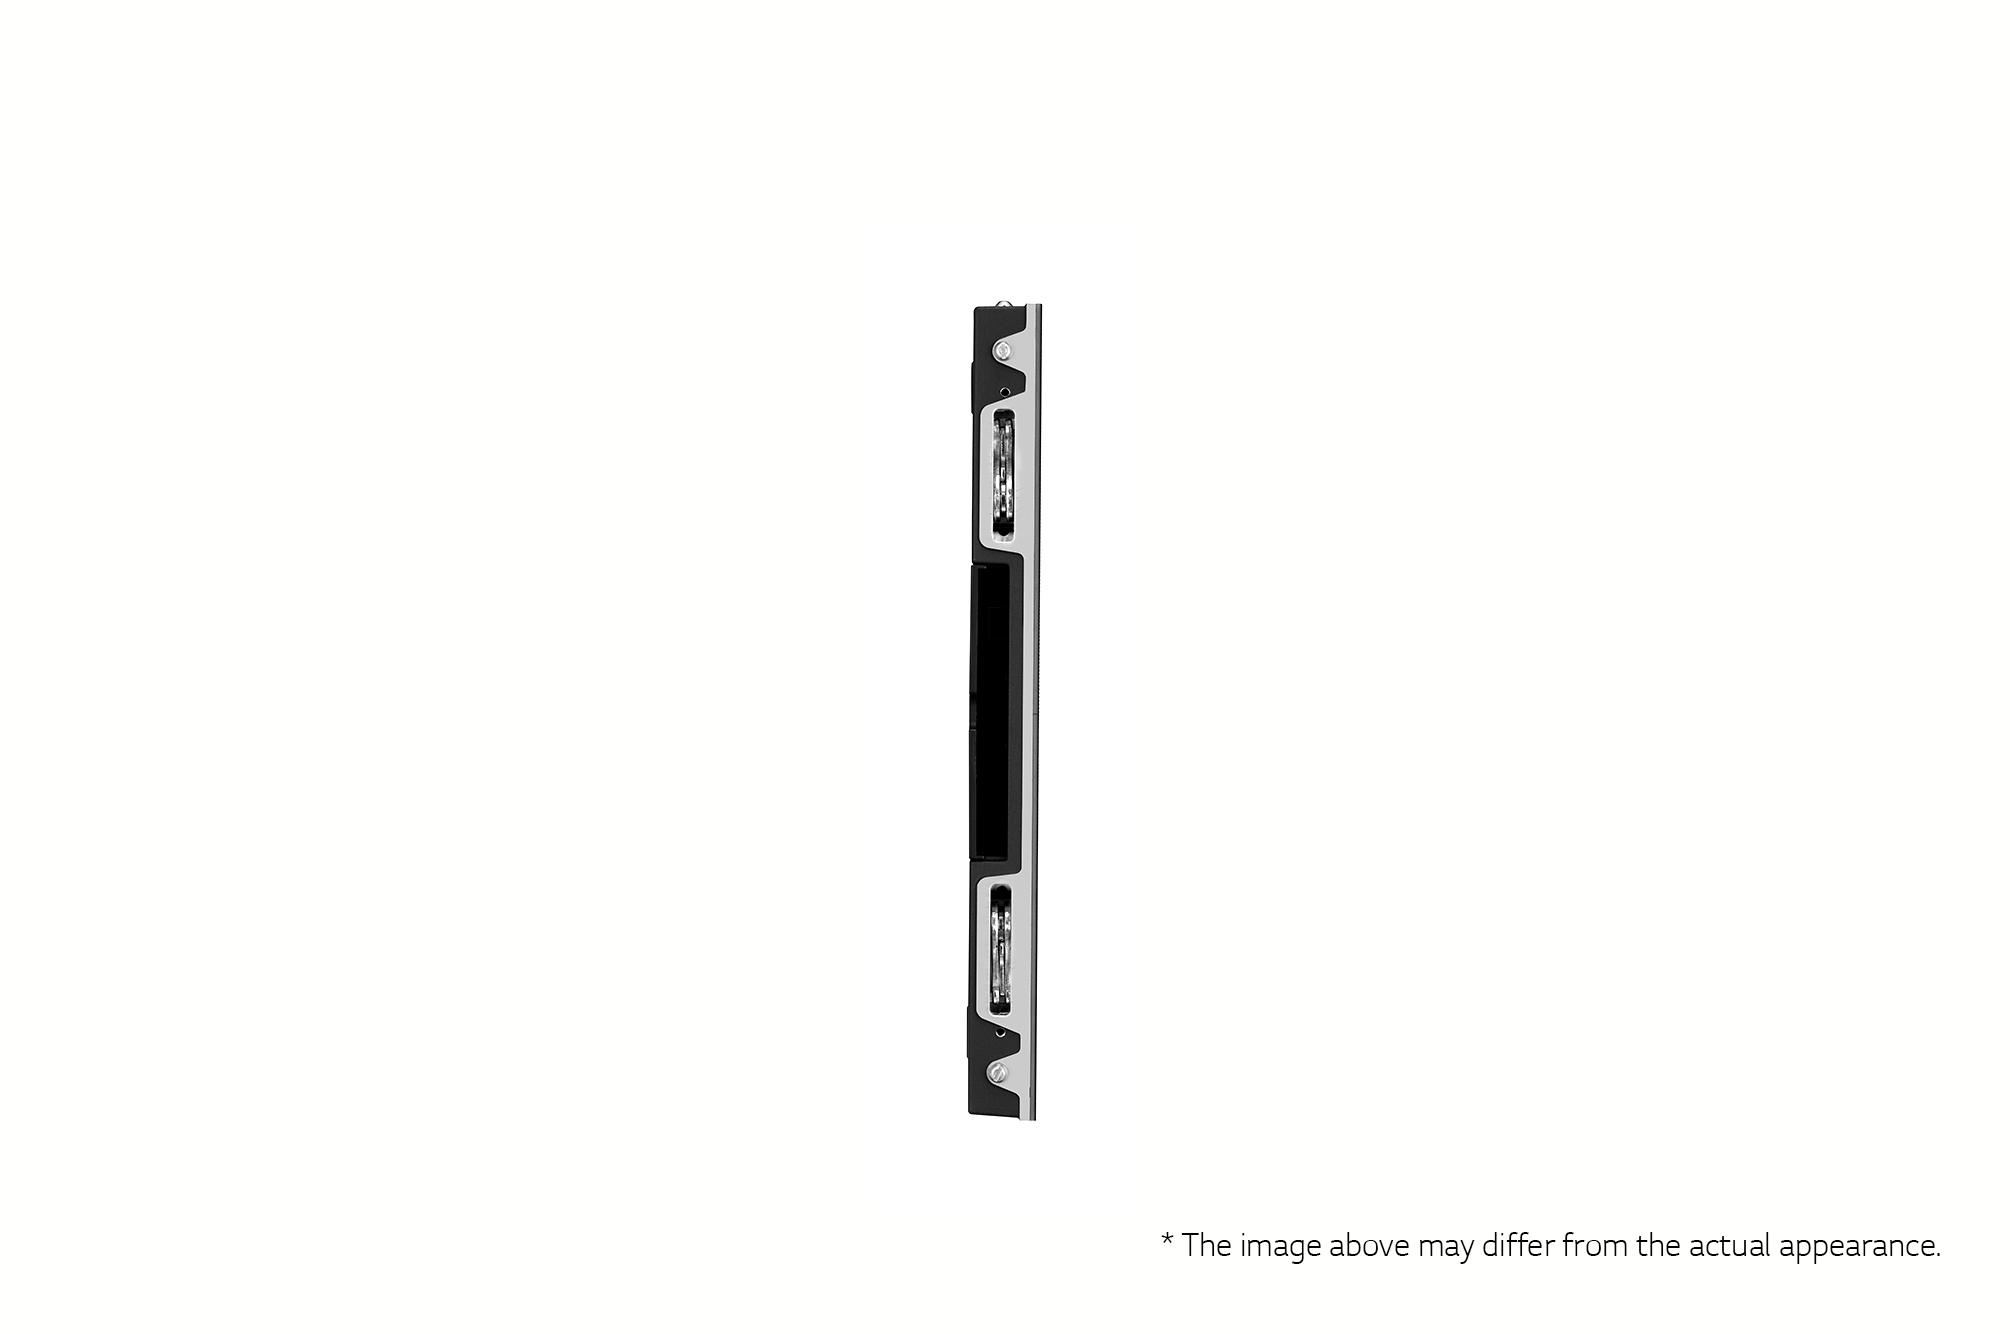 LG Ultra Slim LSCB025 6